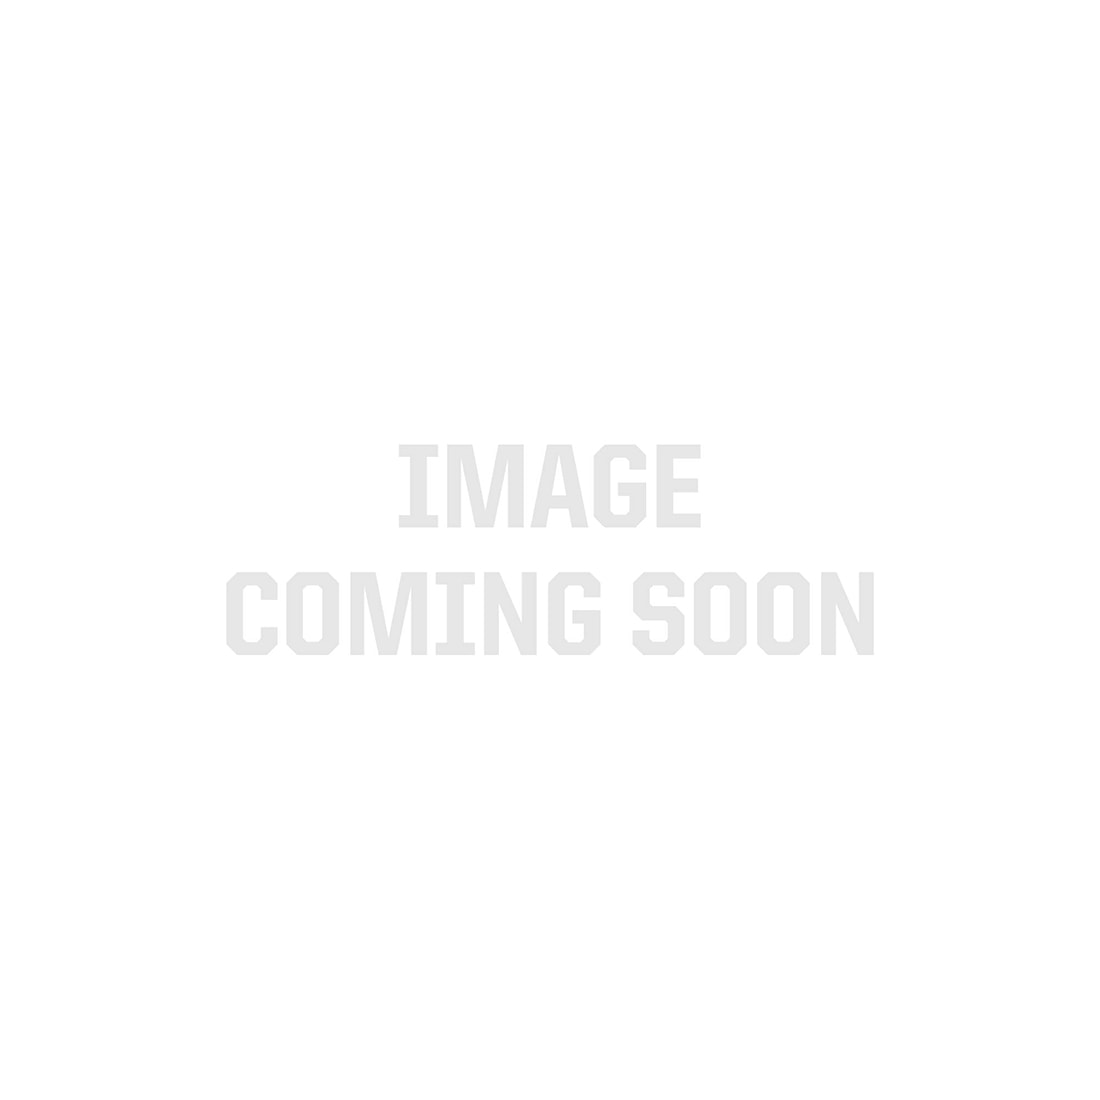 UltraSlim 2016 LED Strip Light - 5,000K - 120/m - Sample Kit